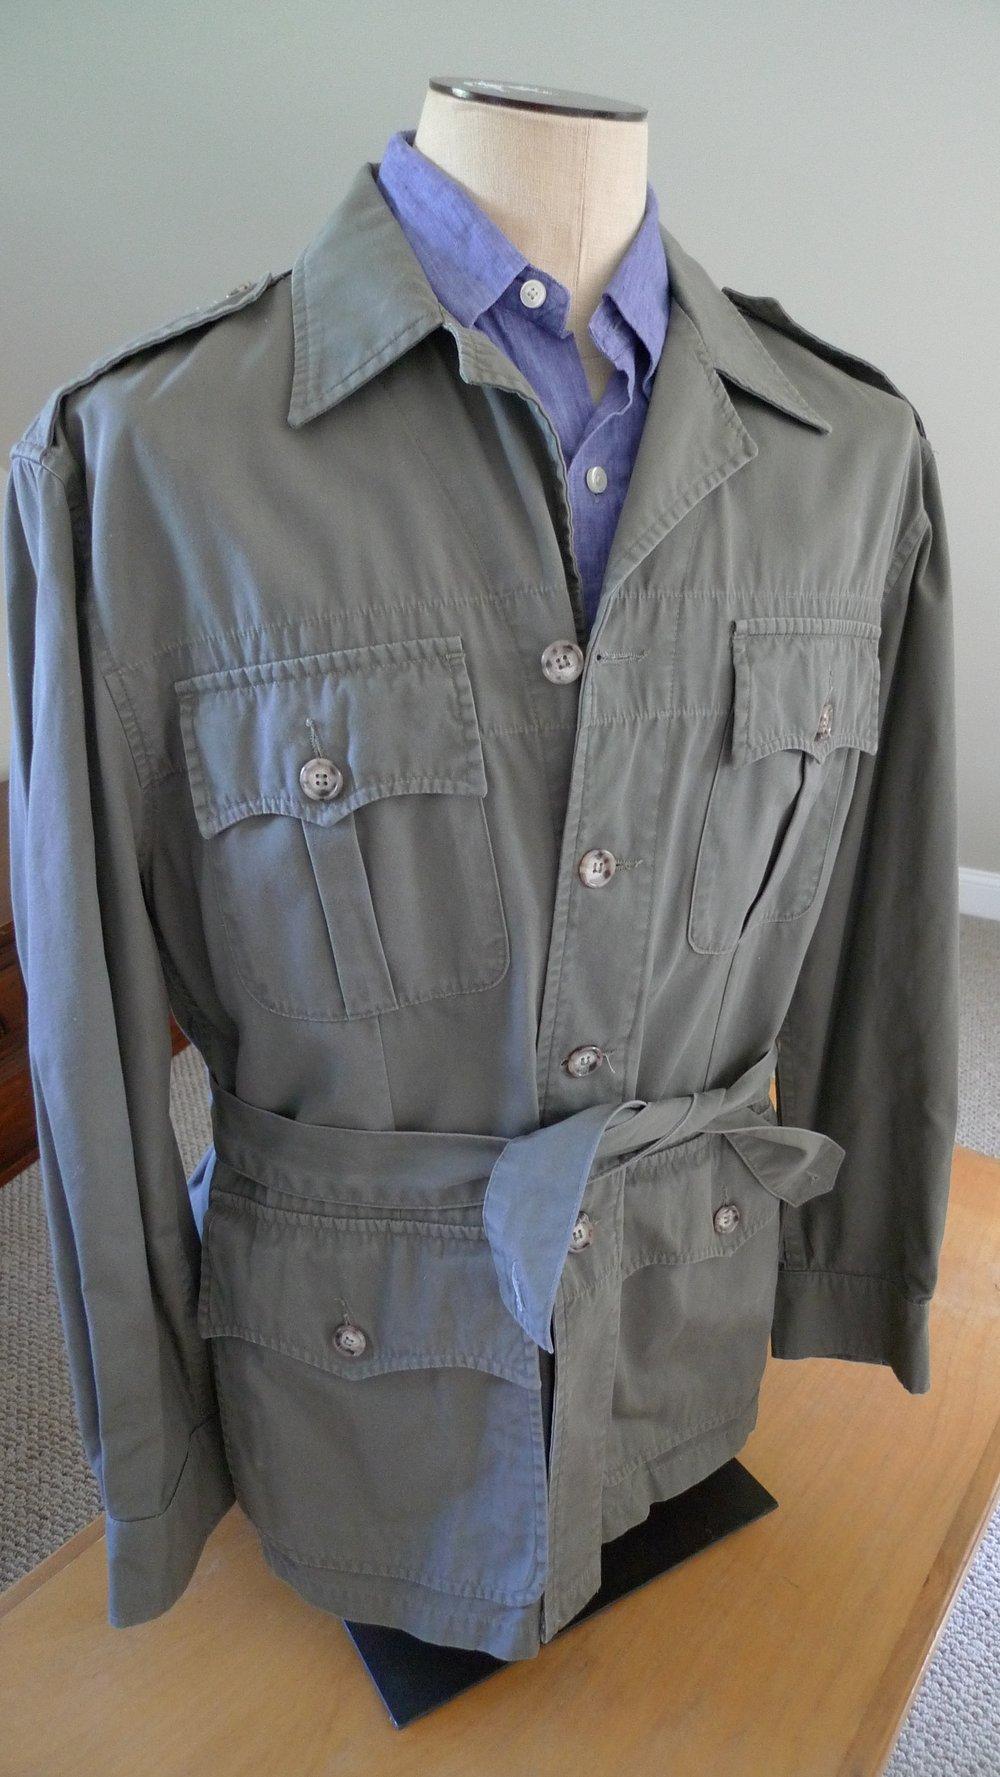 Willis Amp Geiger Bush Poplin Safari Jacket Size Medium